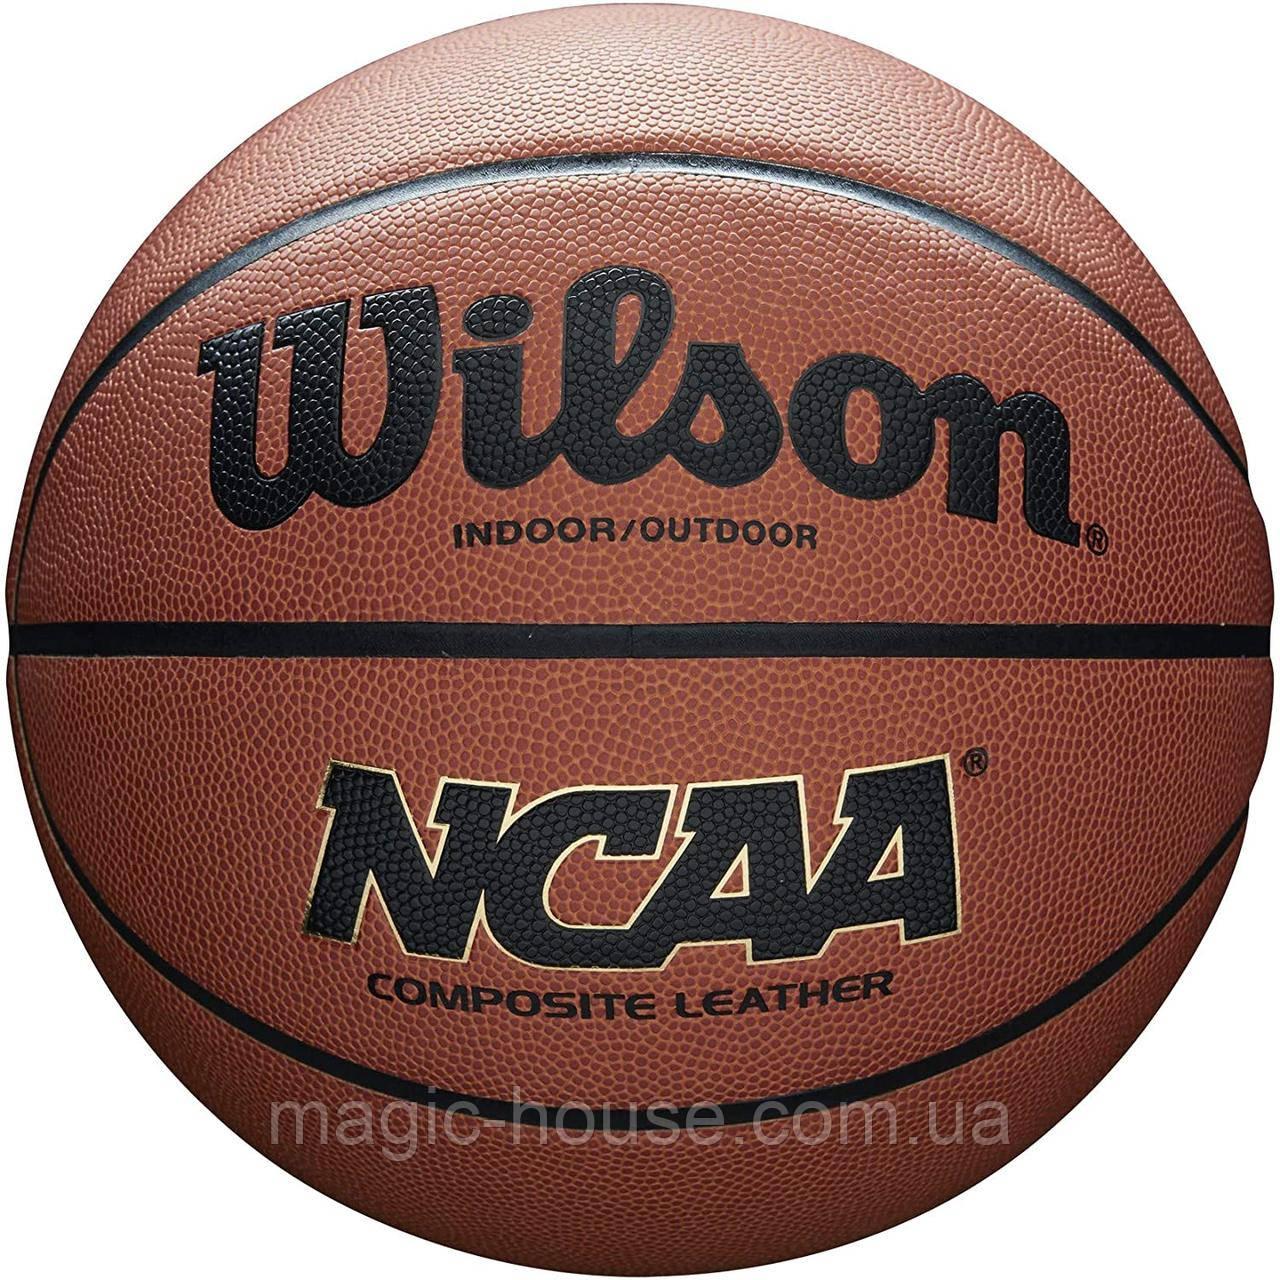 М'яч баскетбольний Wilson NCAA Composite Basketball оригінал розмір 7 композитна шкіра